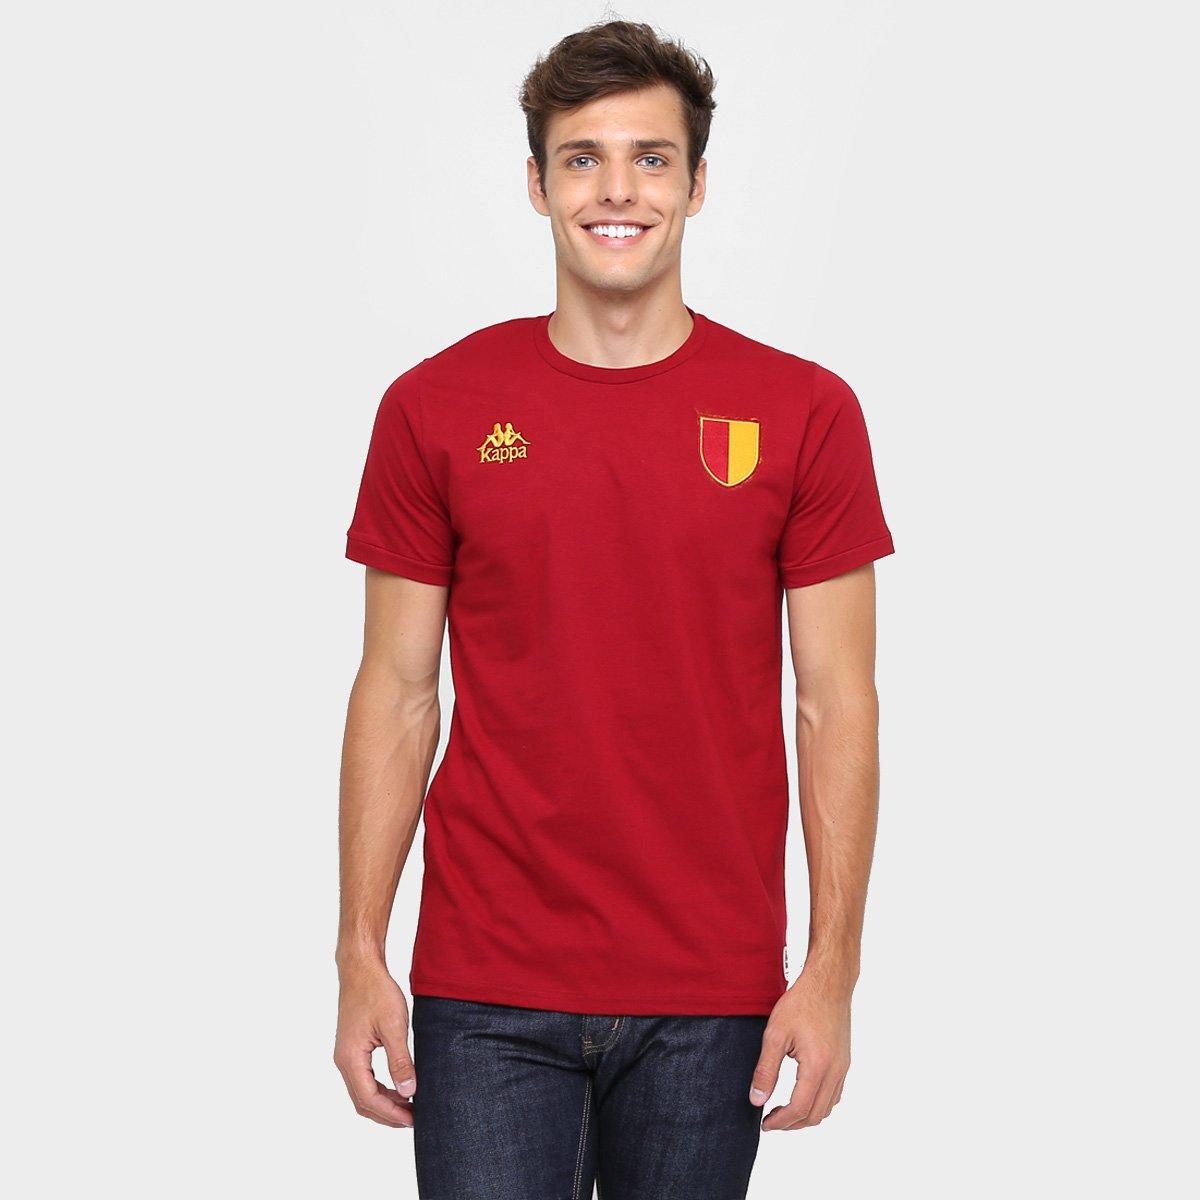 Camisetas para Futebol Kappa  41cf0d322e4